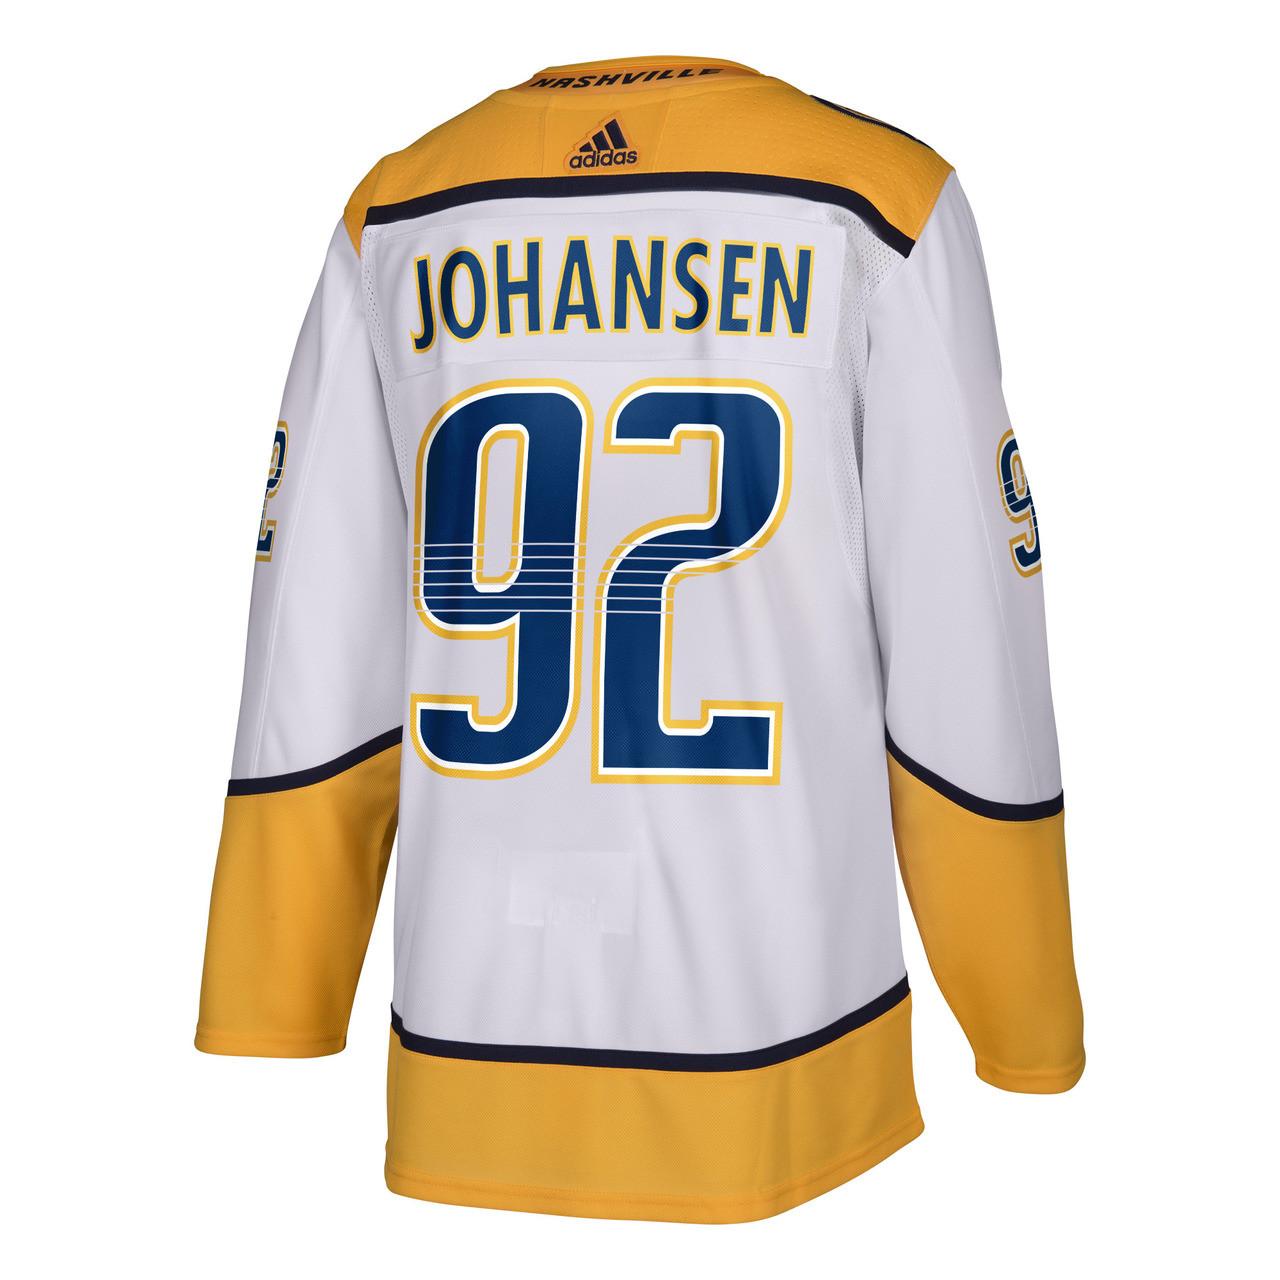 Nashville Predators Adidas Authentic Ryan Johansen Jersey Road White ... b2f6d37cee37